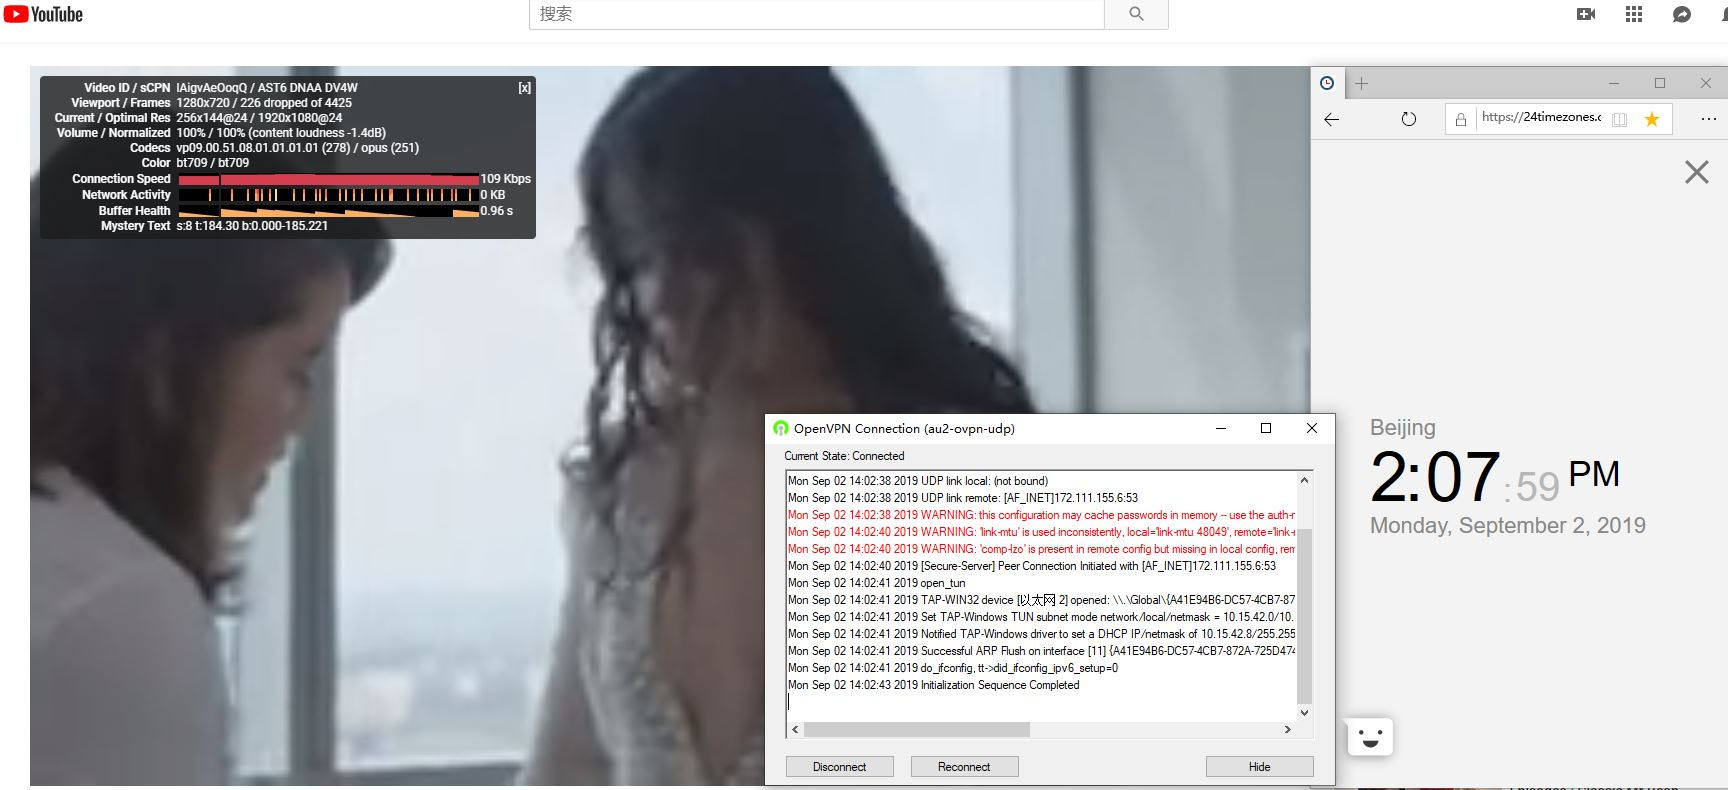 ivacyvpn windows au2-udp 服务器 中国翻墙 科学上网 YouTube测速-20190902